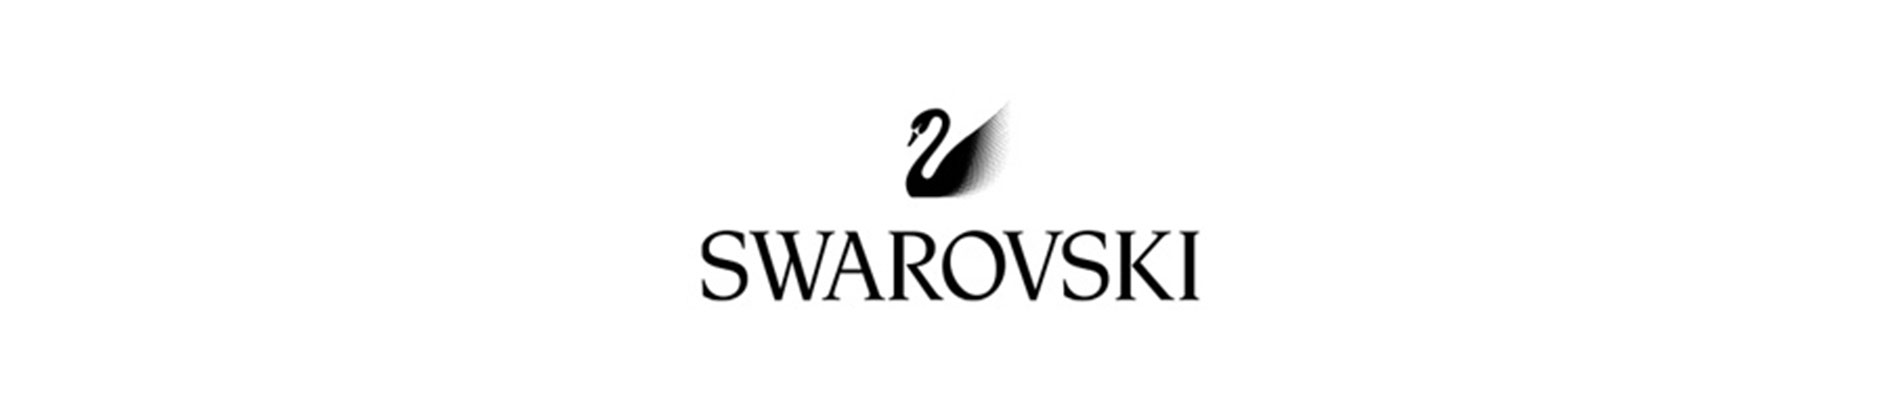 swarovski designer frames header logo